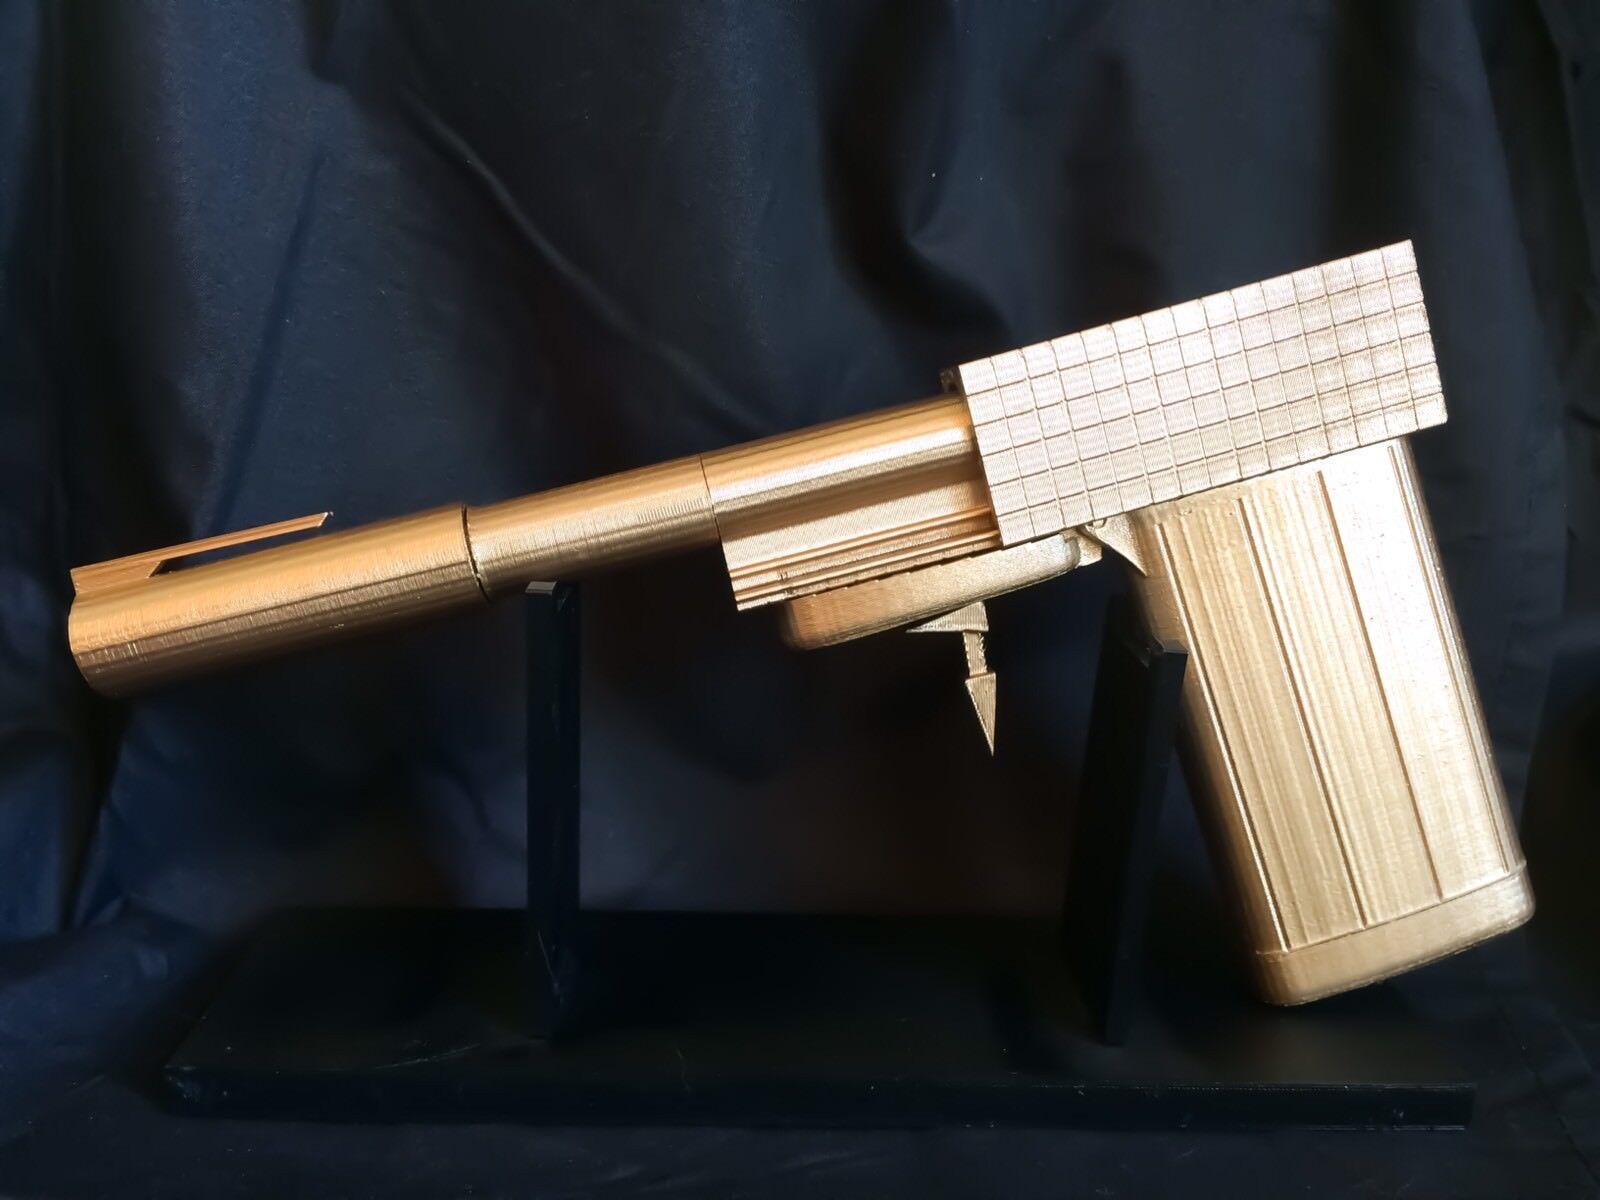 Golden Gun James Bond Cigarette Case Pen Lighter Replica Prop 007 Movie Prop